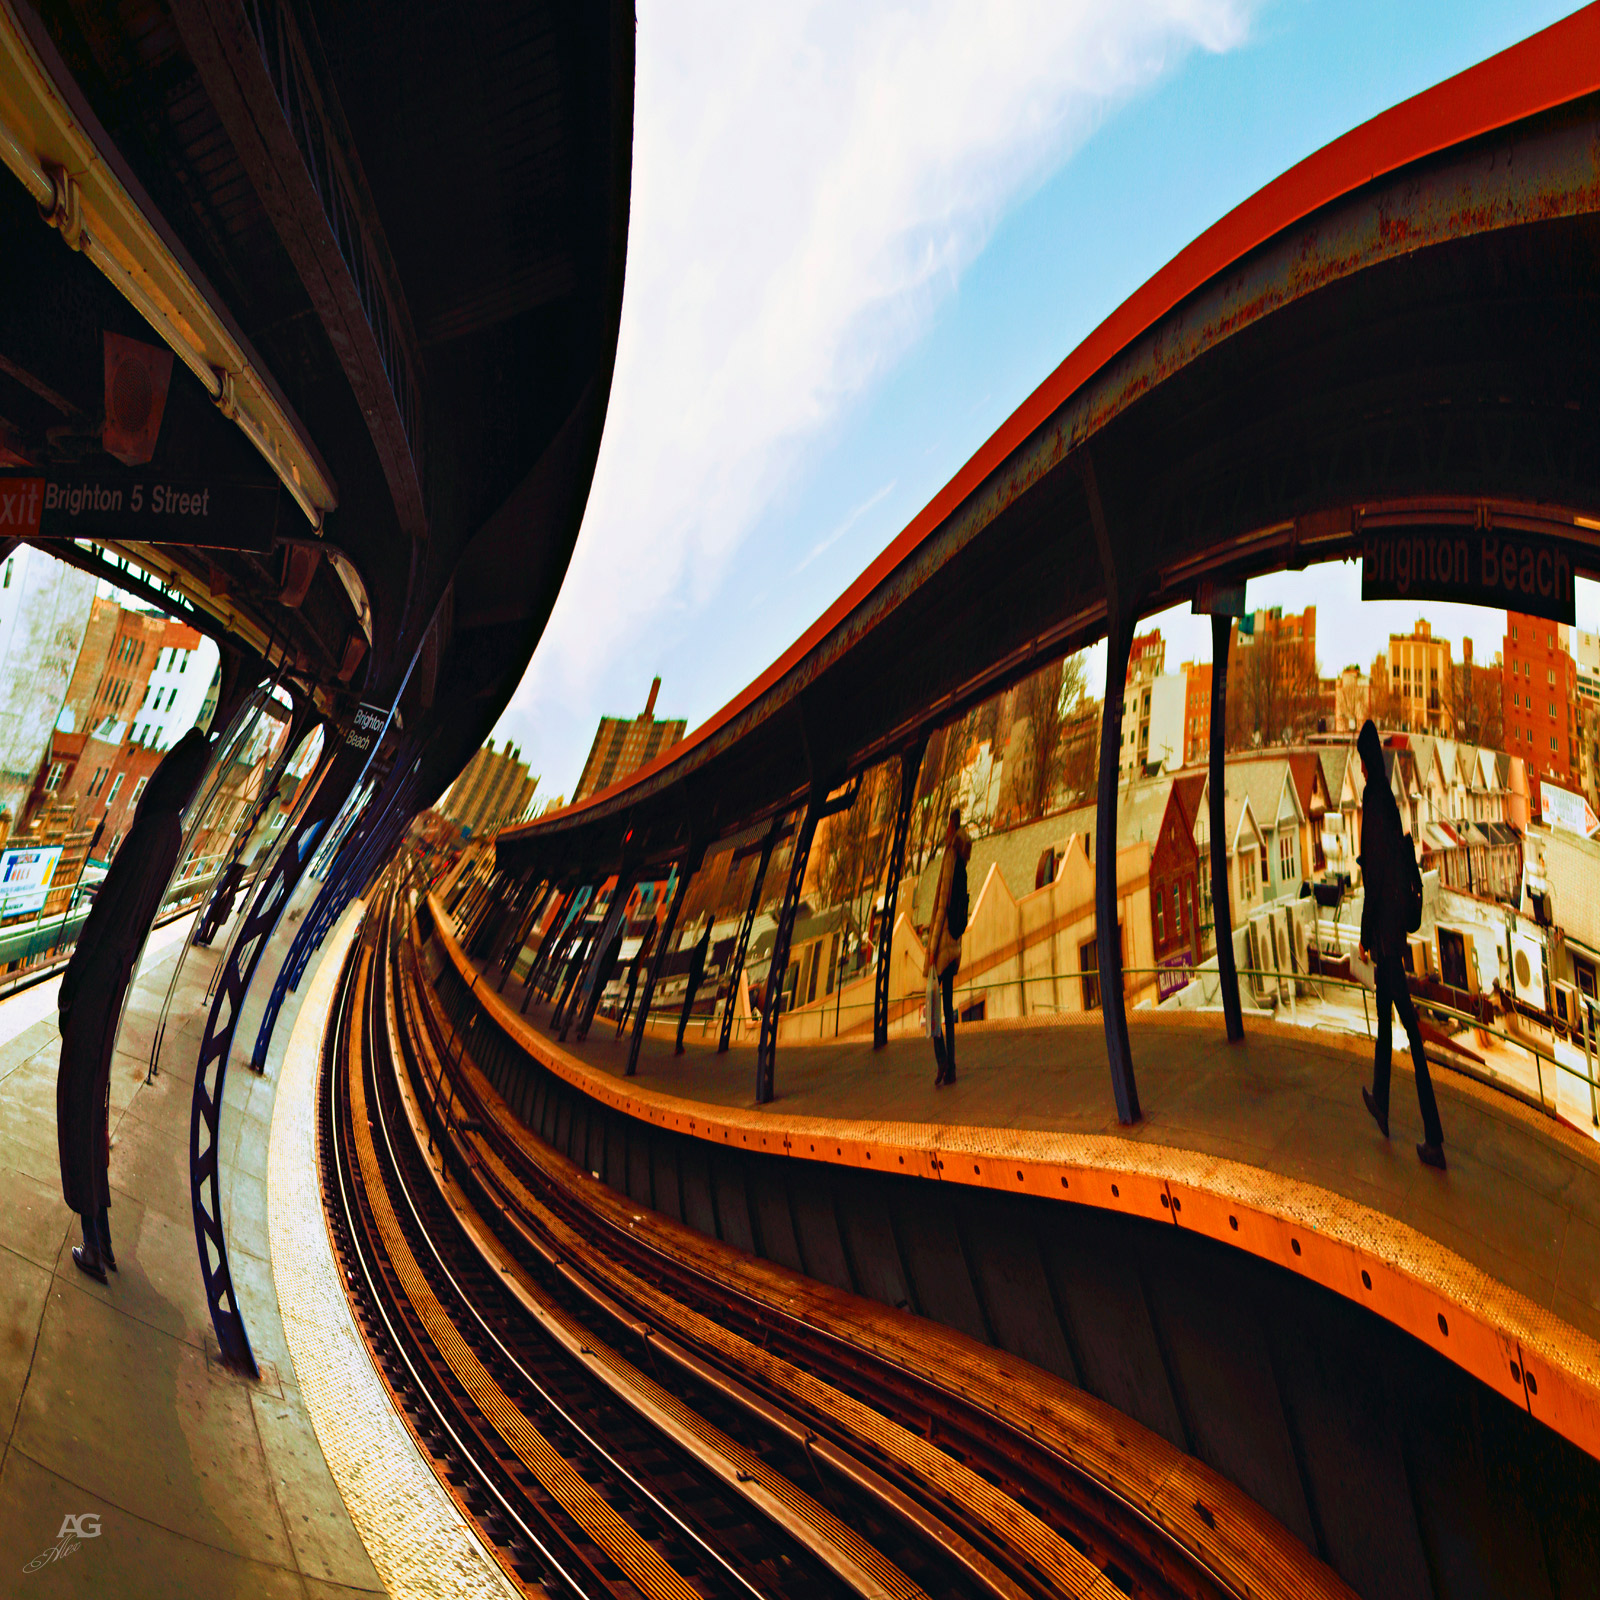 SubwayPlatformBrightonBeachAvenueTrainStationFacingWest_unfoldedTwirled_1600